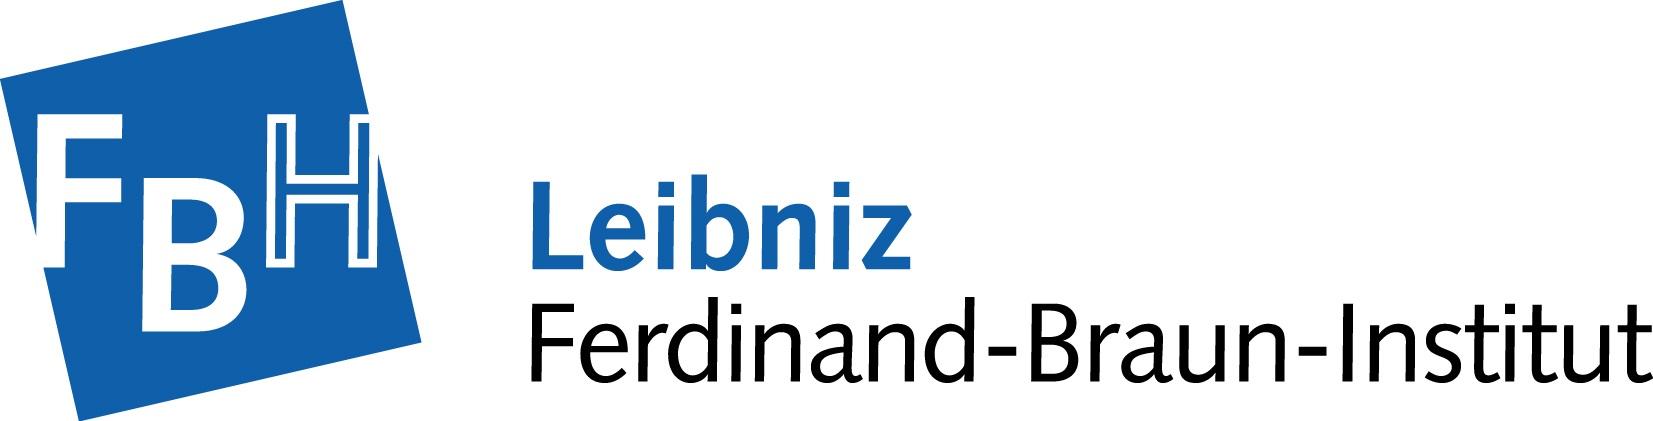 Ferdinand-Braun-Institut